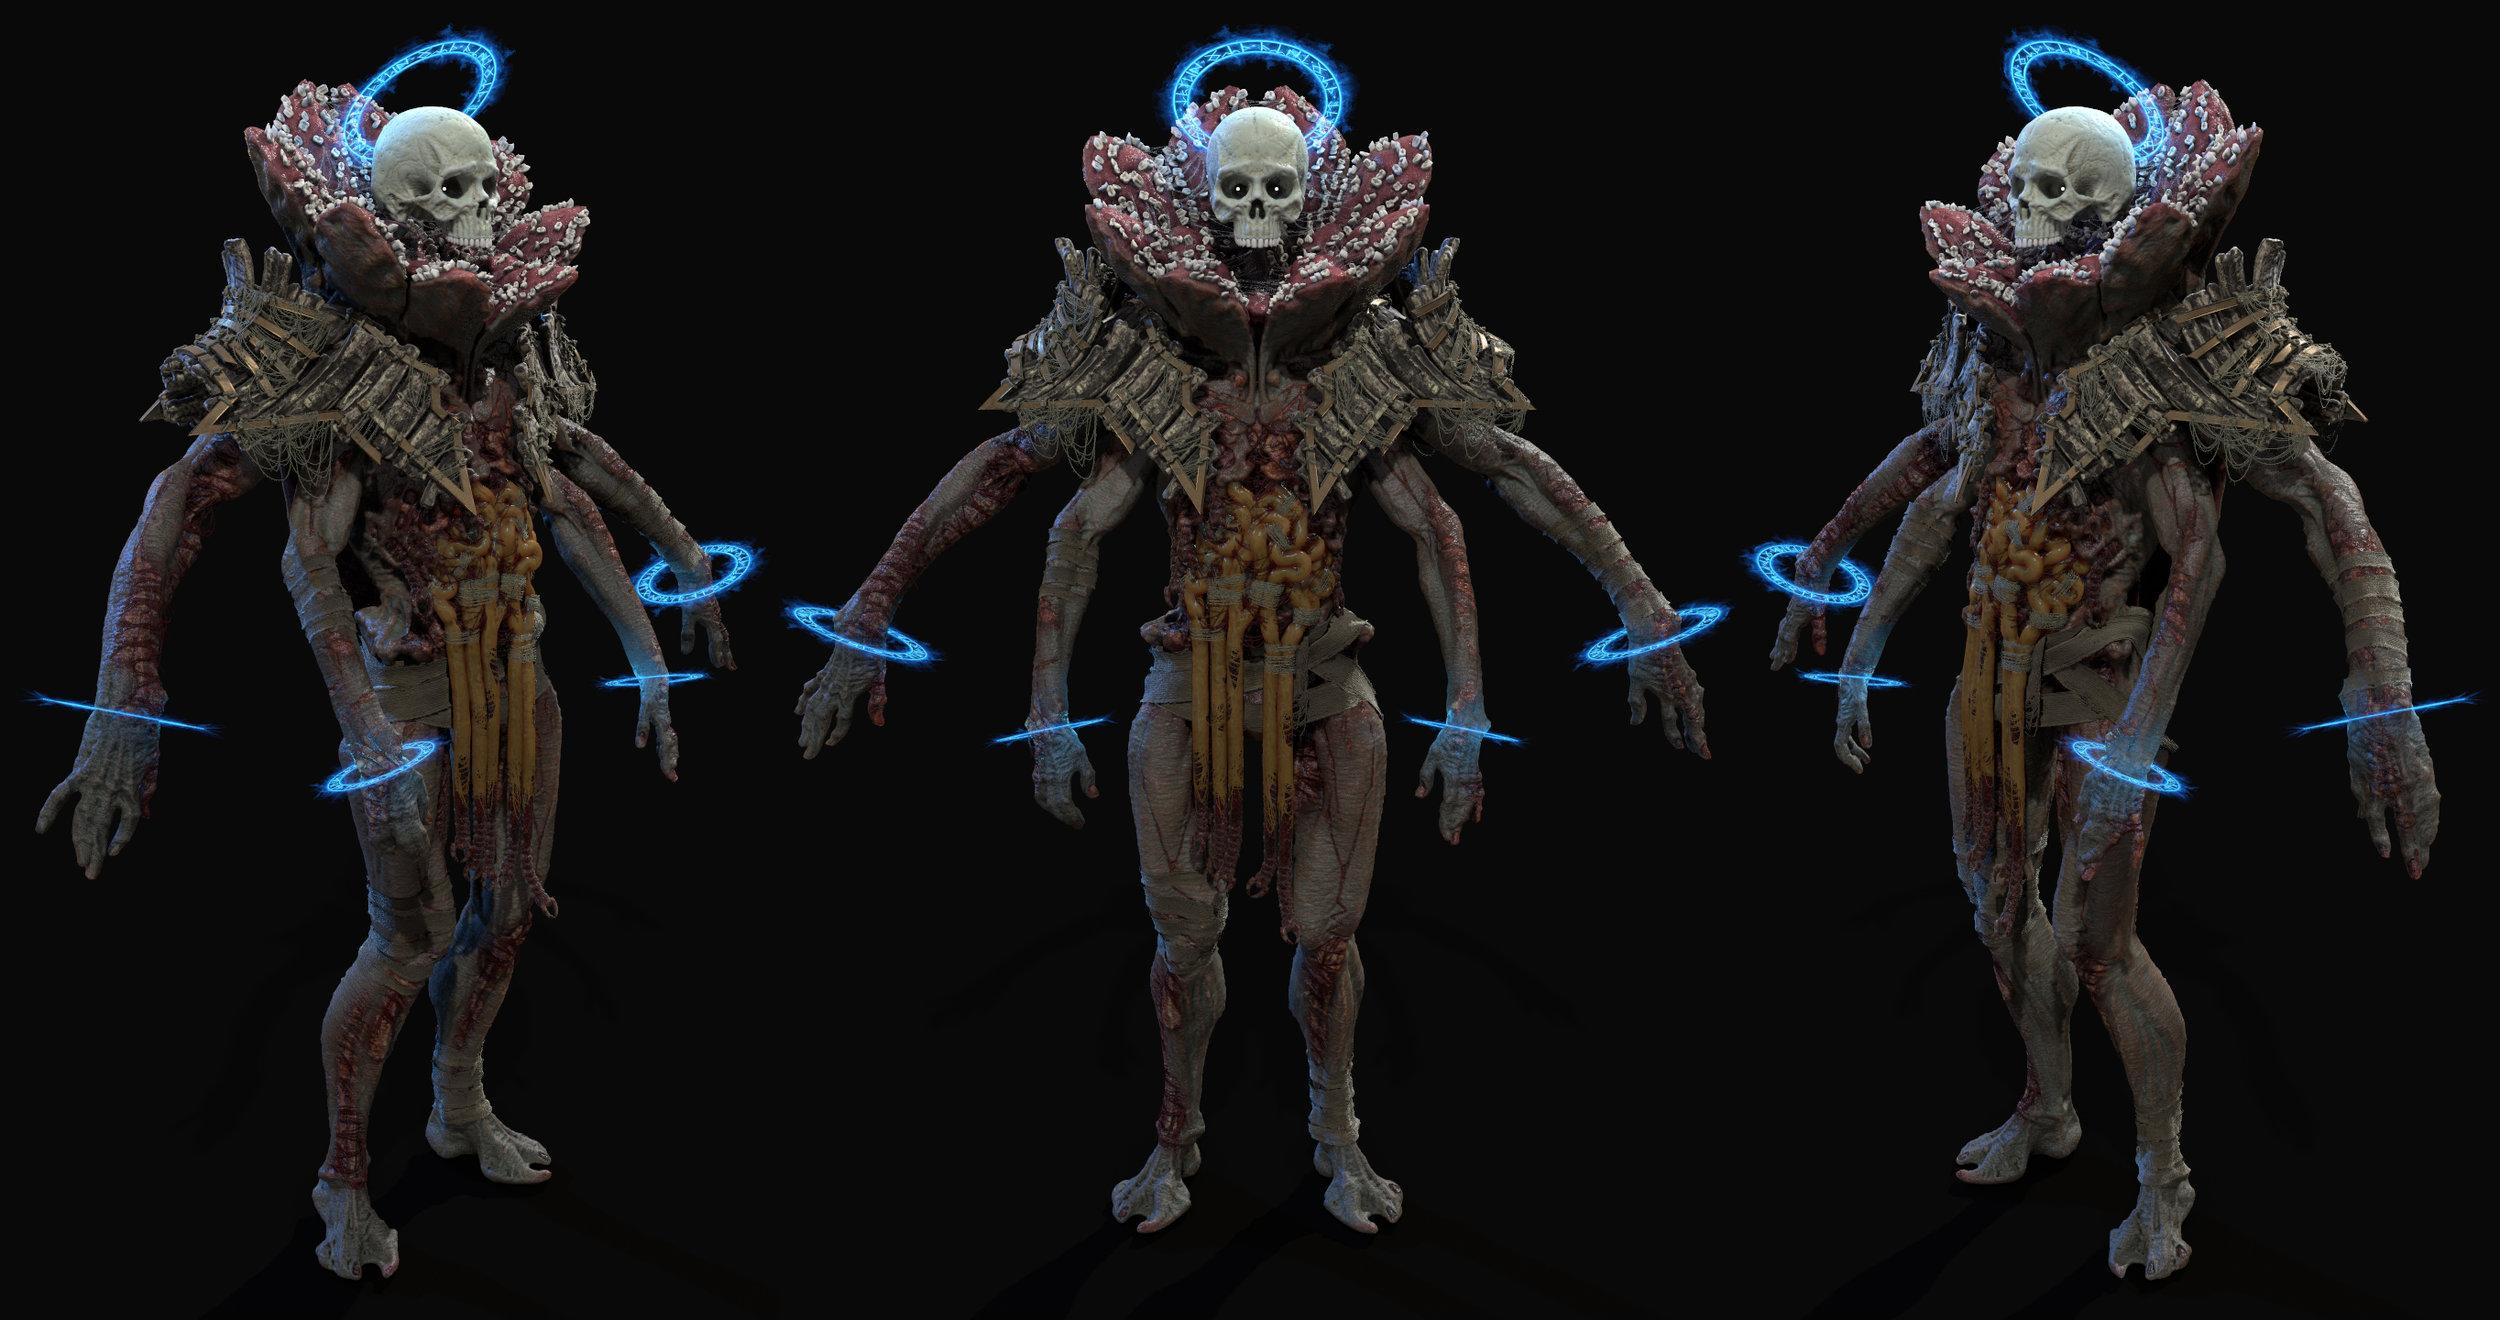 skull_head_body_turnaround_01_large.jpg